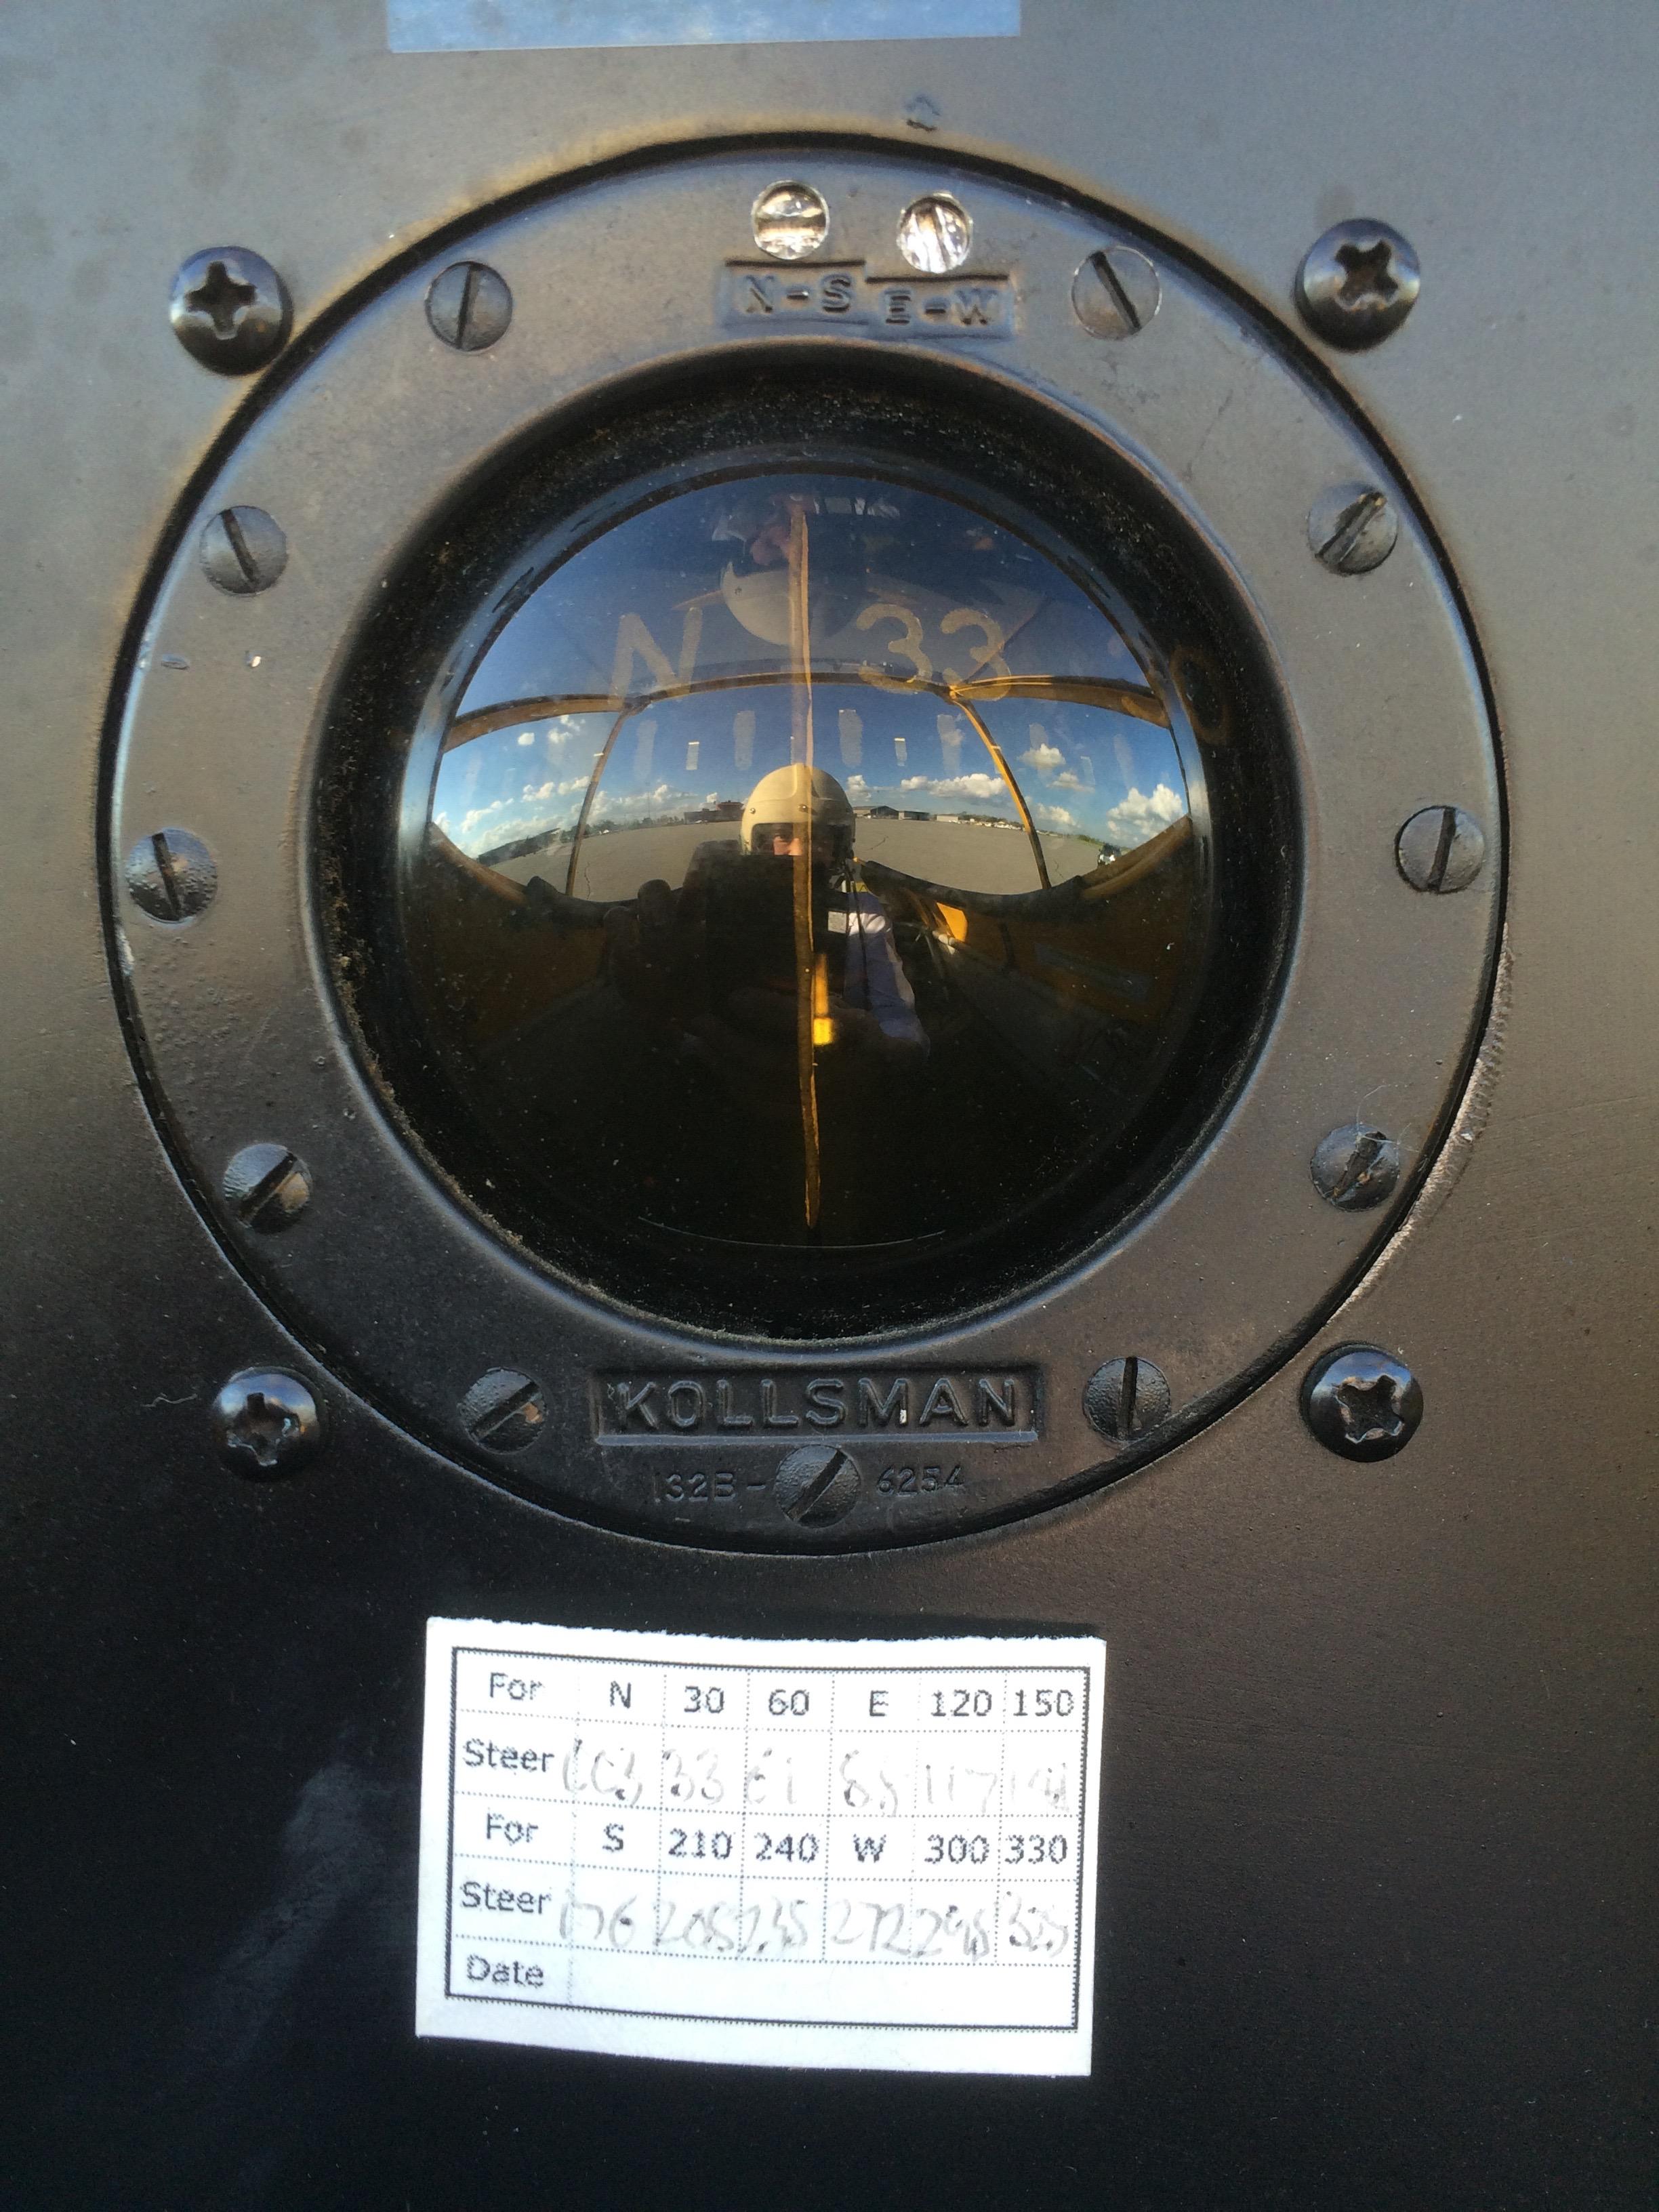 Me looking into an instrument gauge.